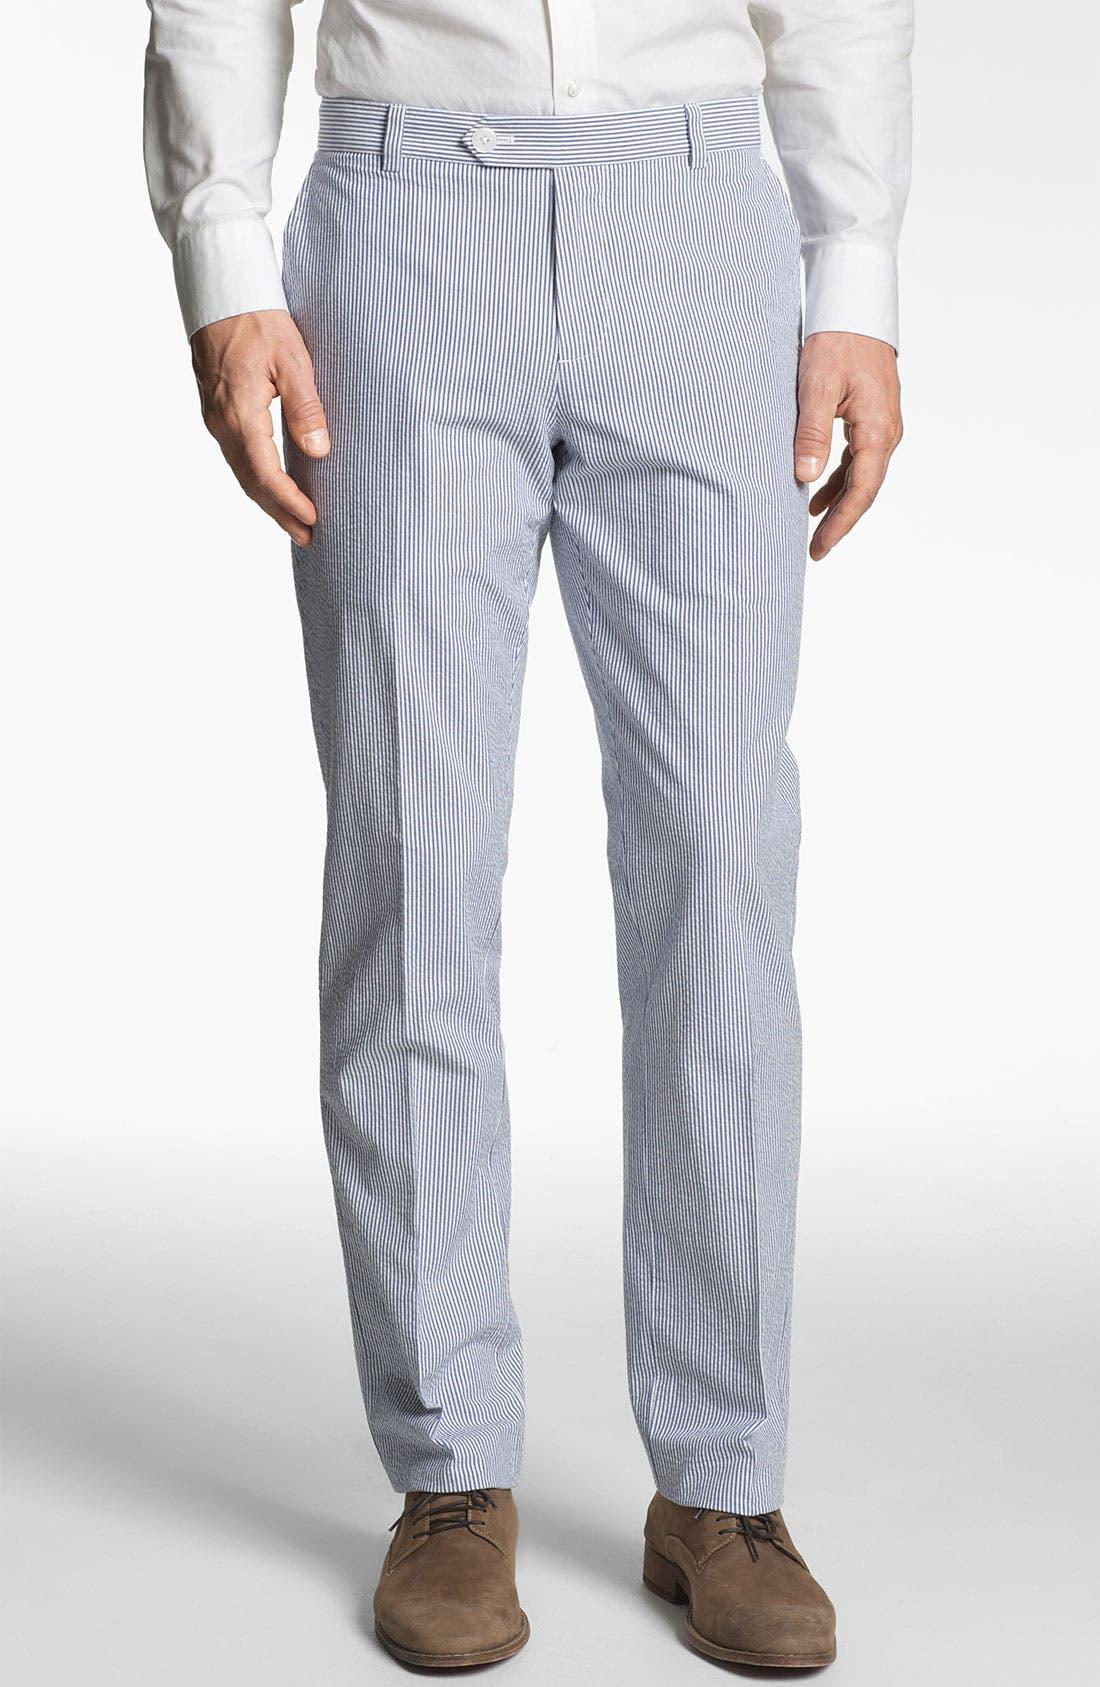 Alternate Image 1 Selected - Brooks Brothers 'Milano' Seersucker Pants